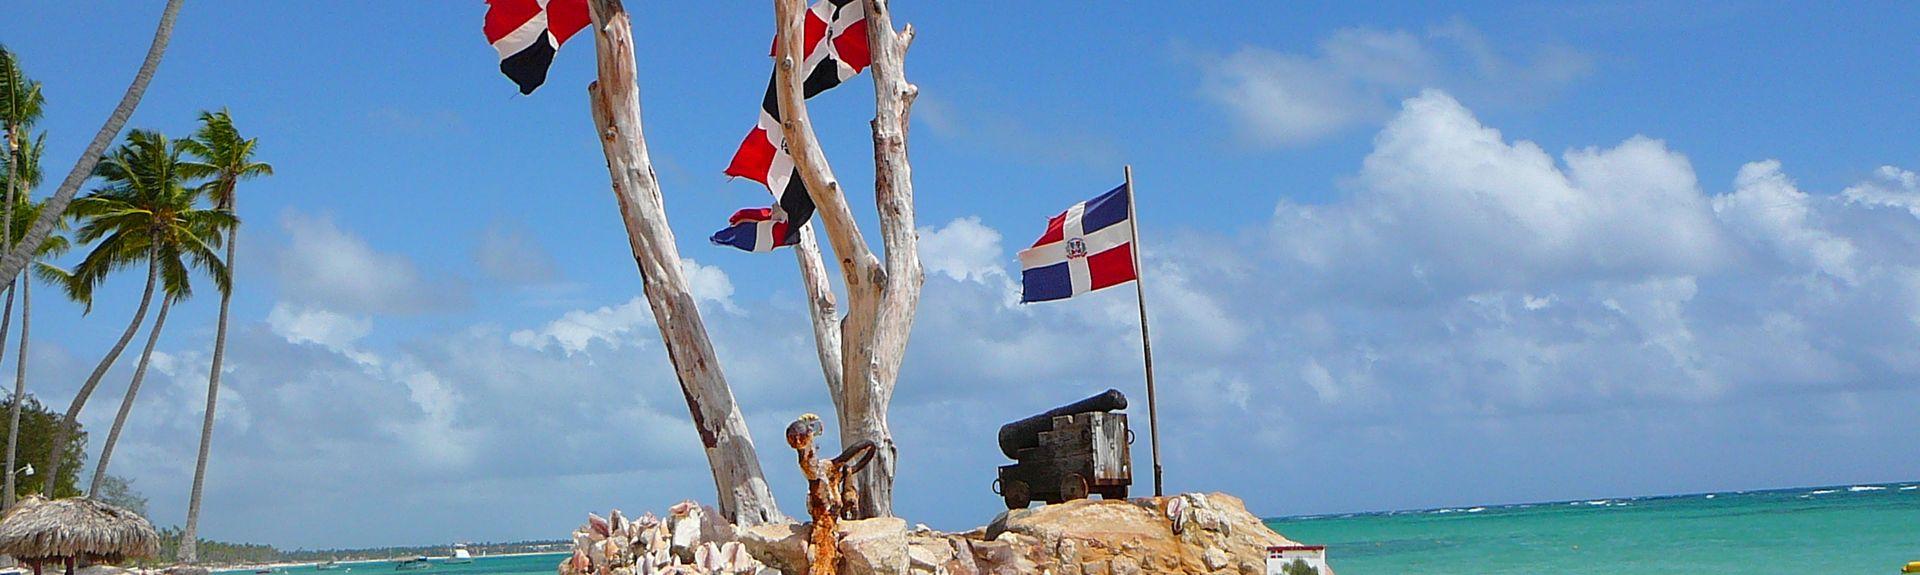 Punta Cana International Airport (PUJ), Punta Cana, La Altagracia Province, Dominican Republic